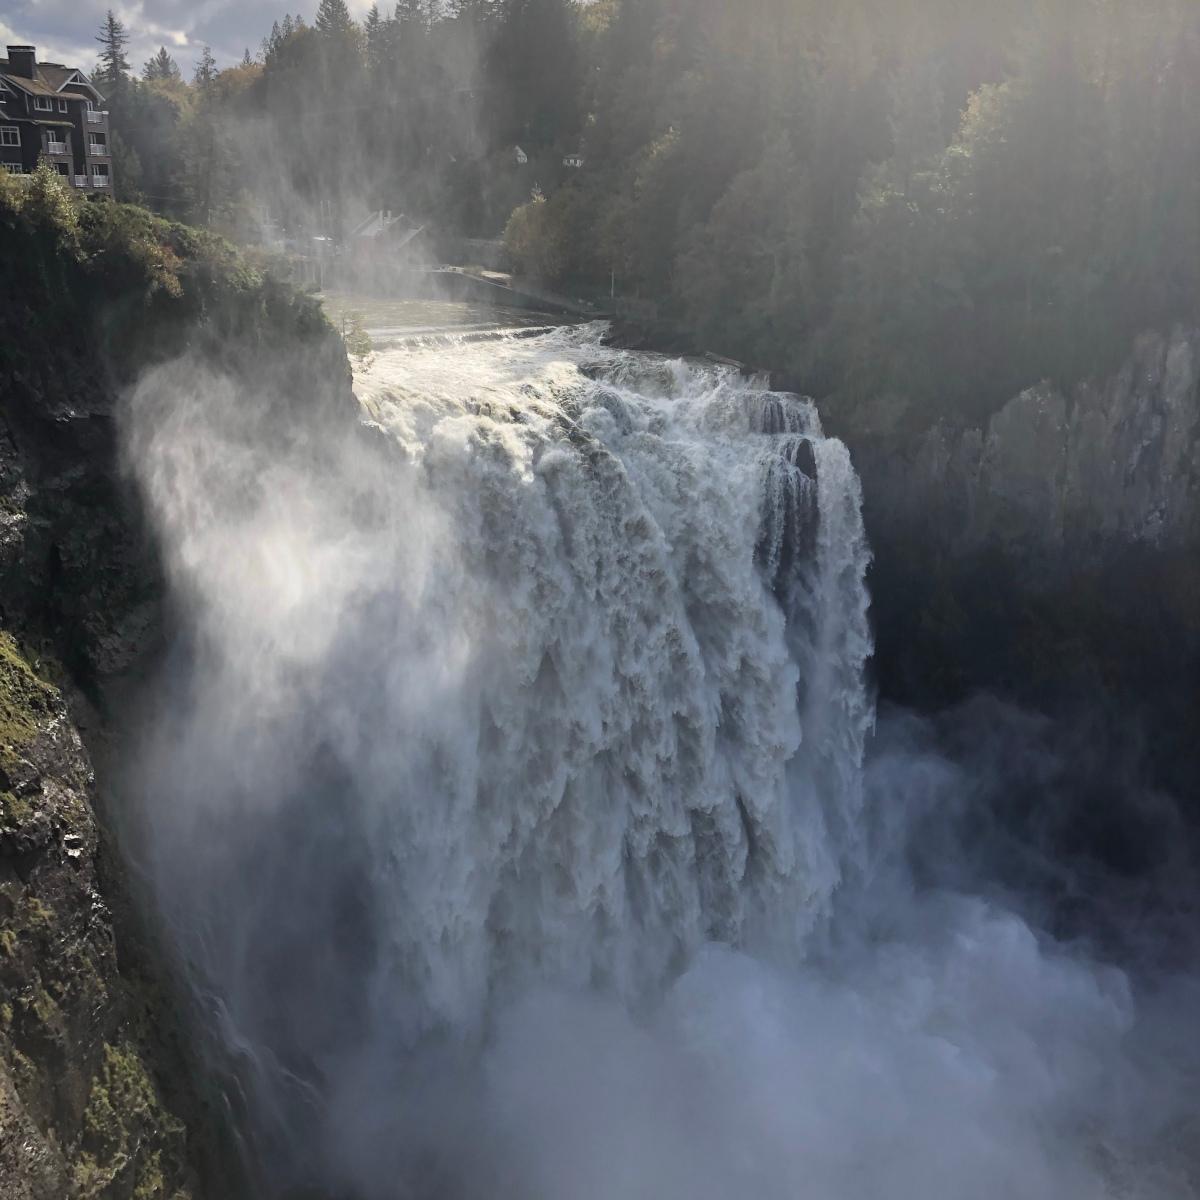 Snoqualmie Falls Water fall in Snoqualmie, WA